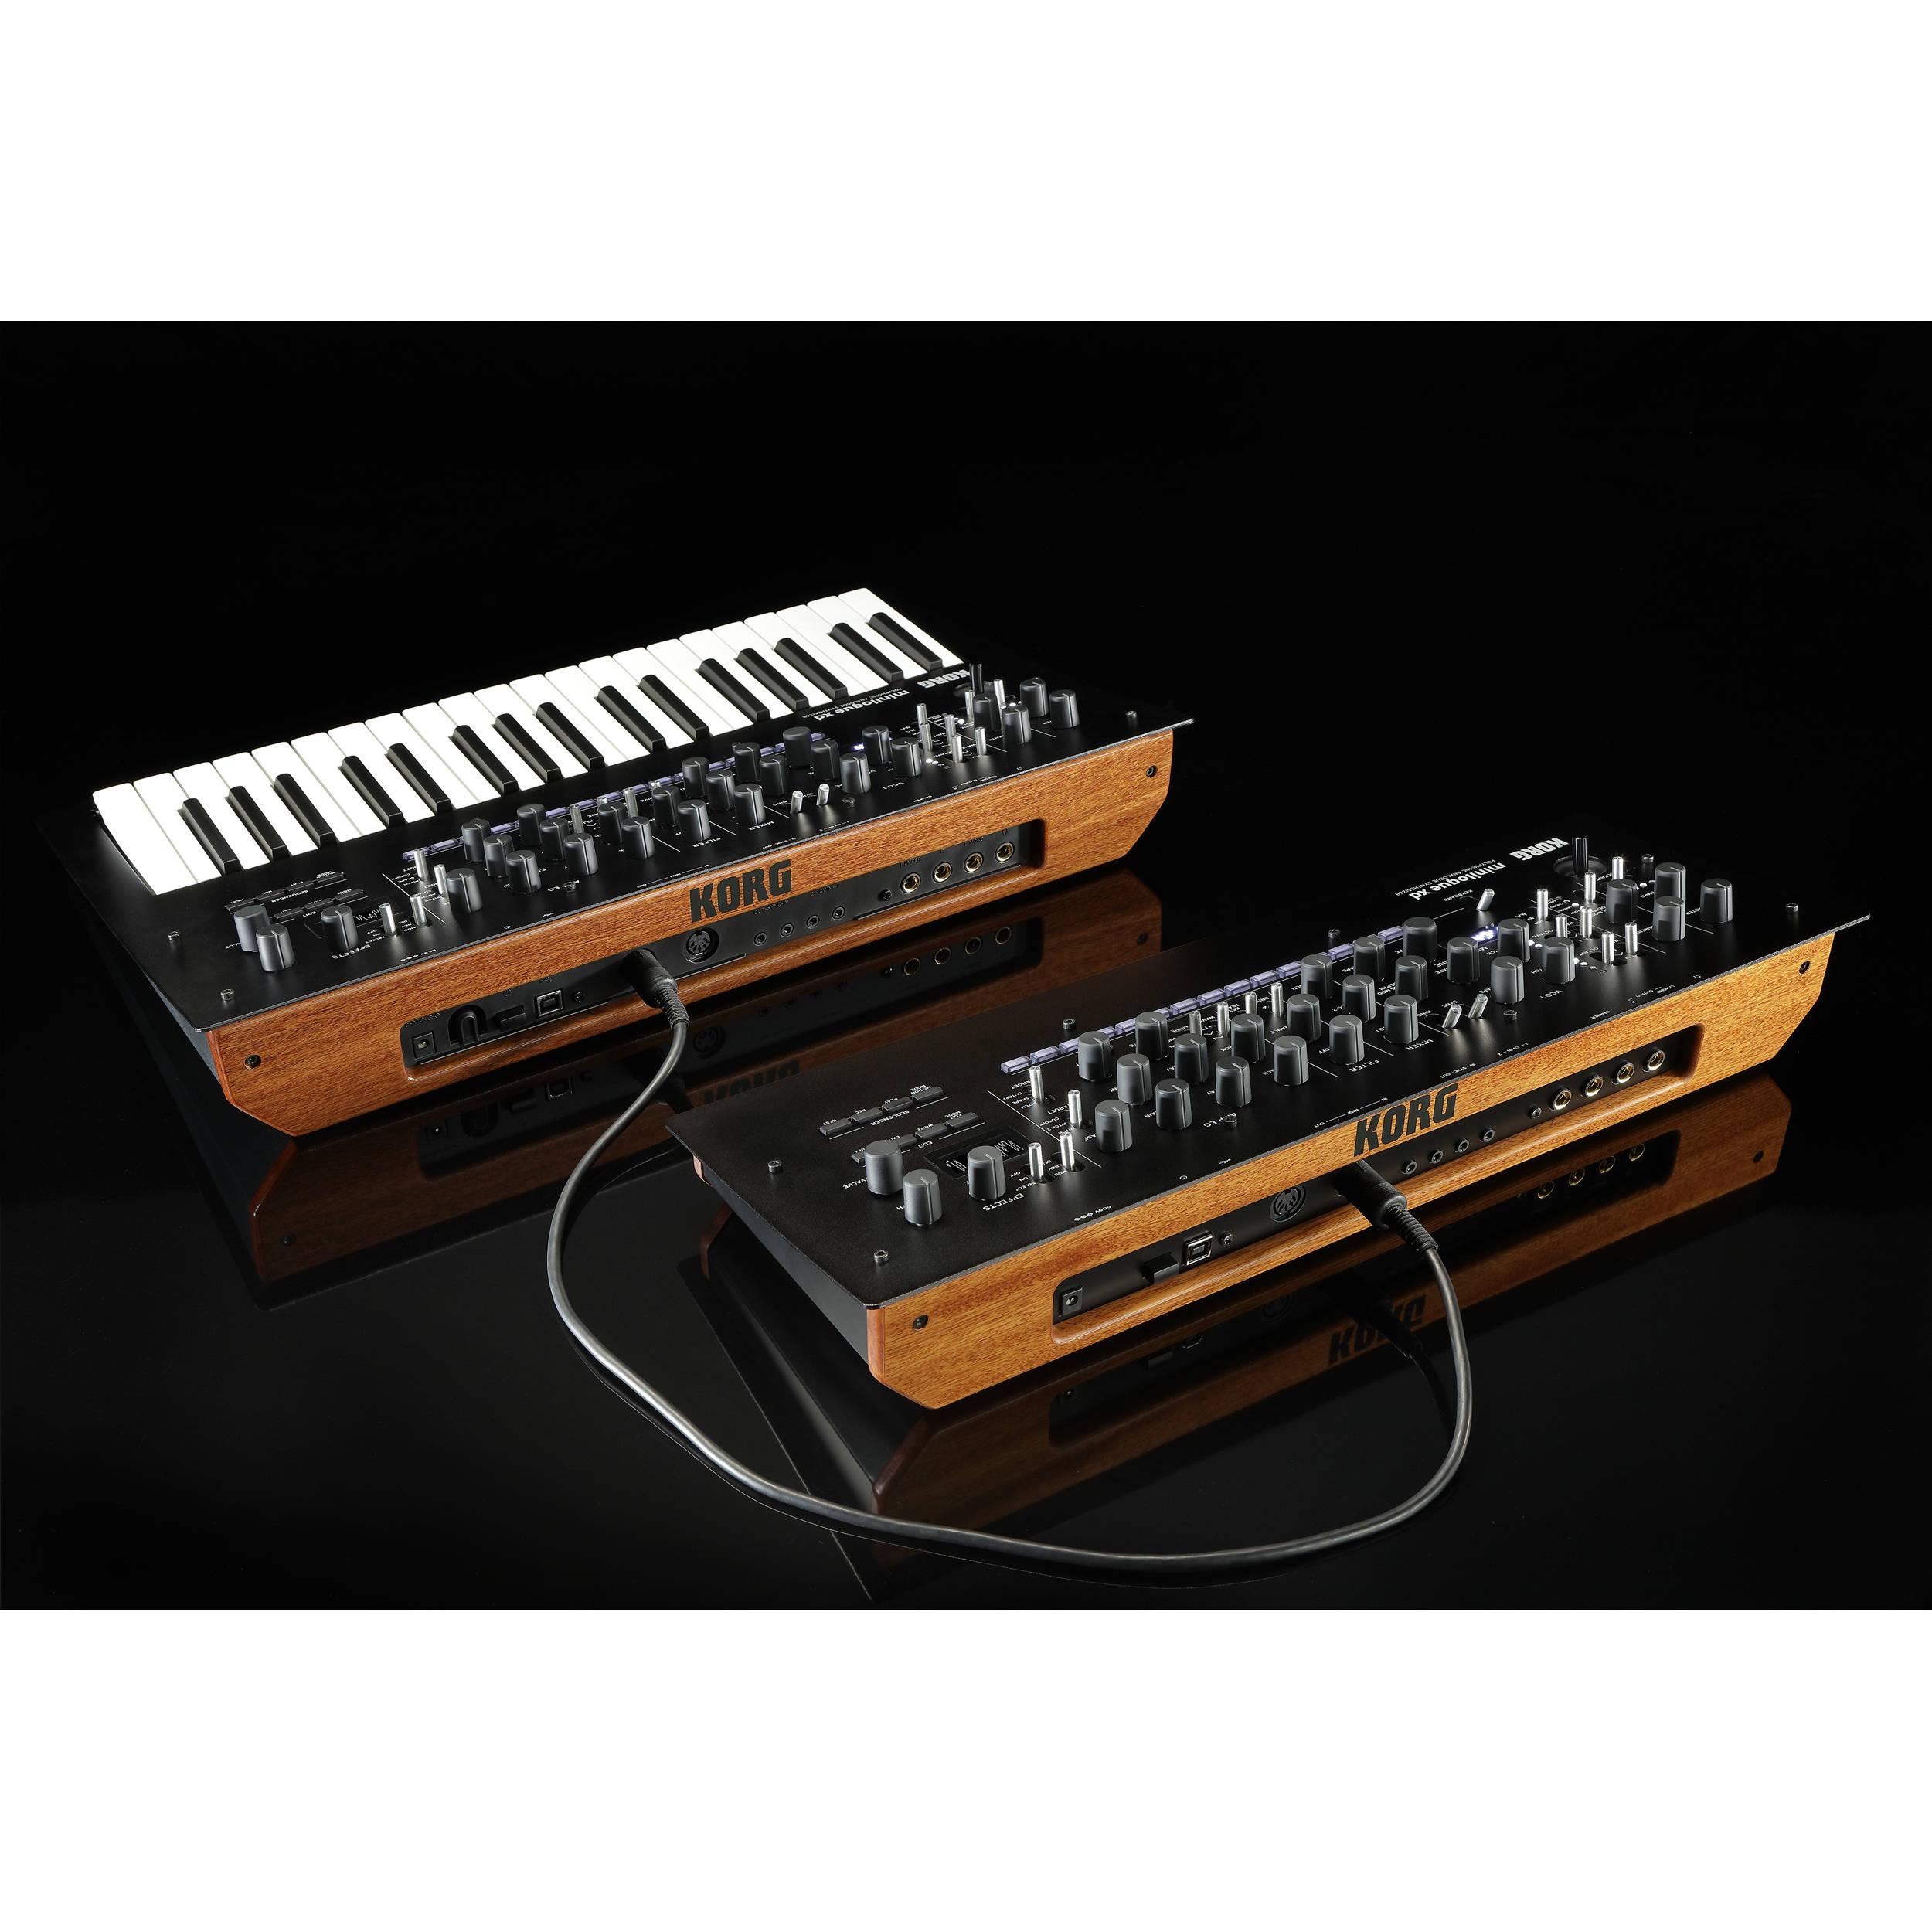 Korg minilogue xd module - Polyphonic Analog Synthesizer Desktop Module  (4-Voice)